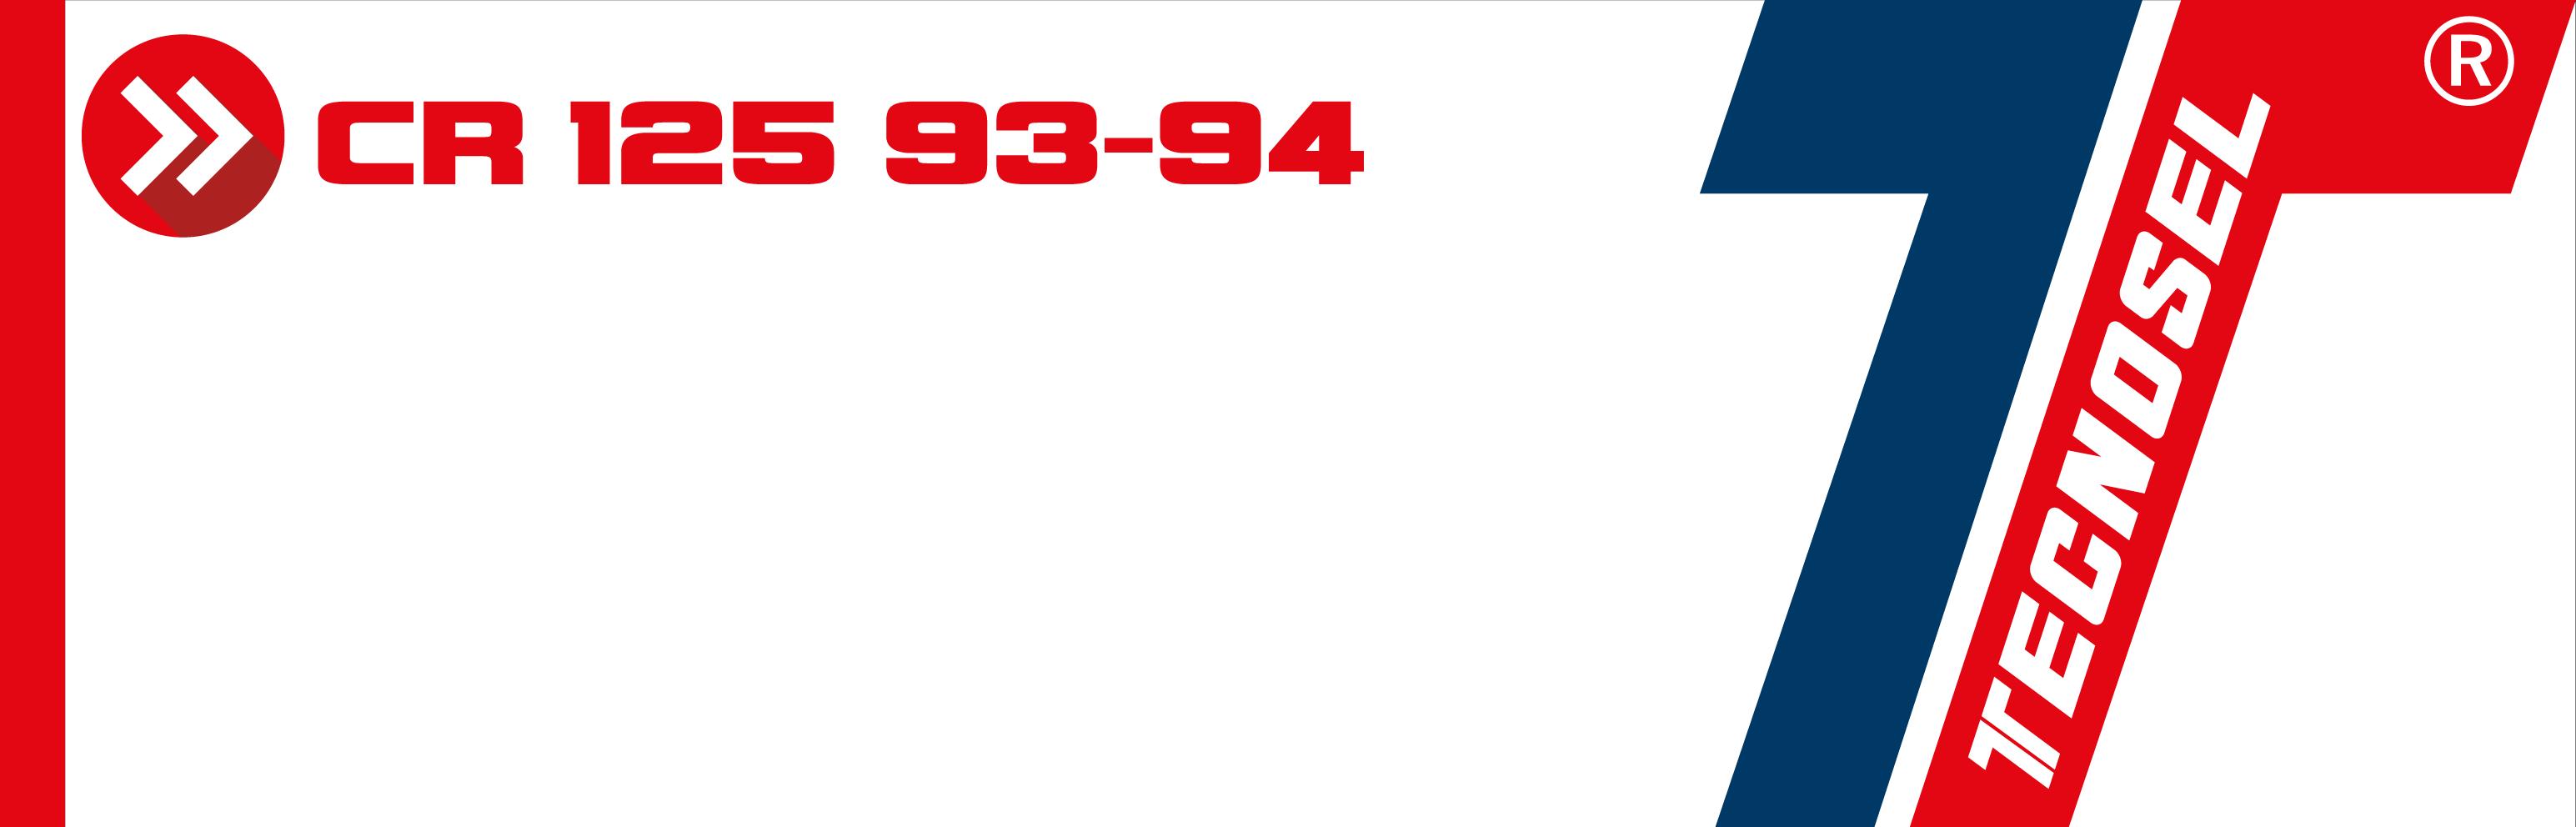 CR 125 93>94